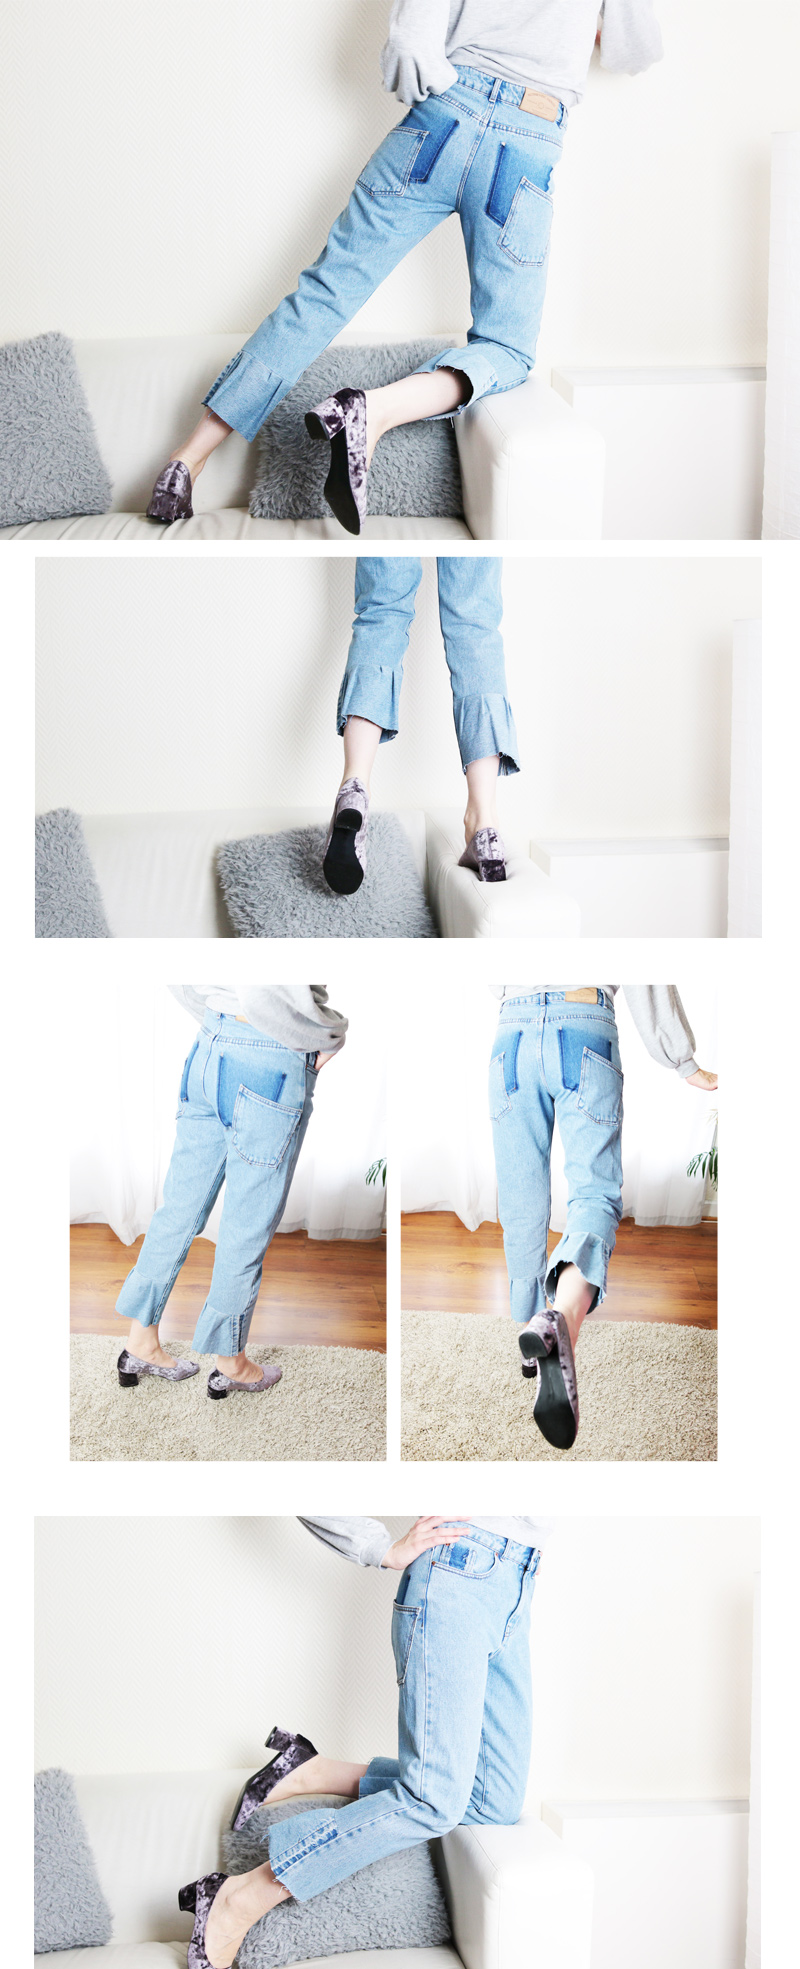 jeans-porte_01